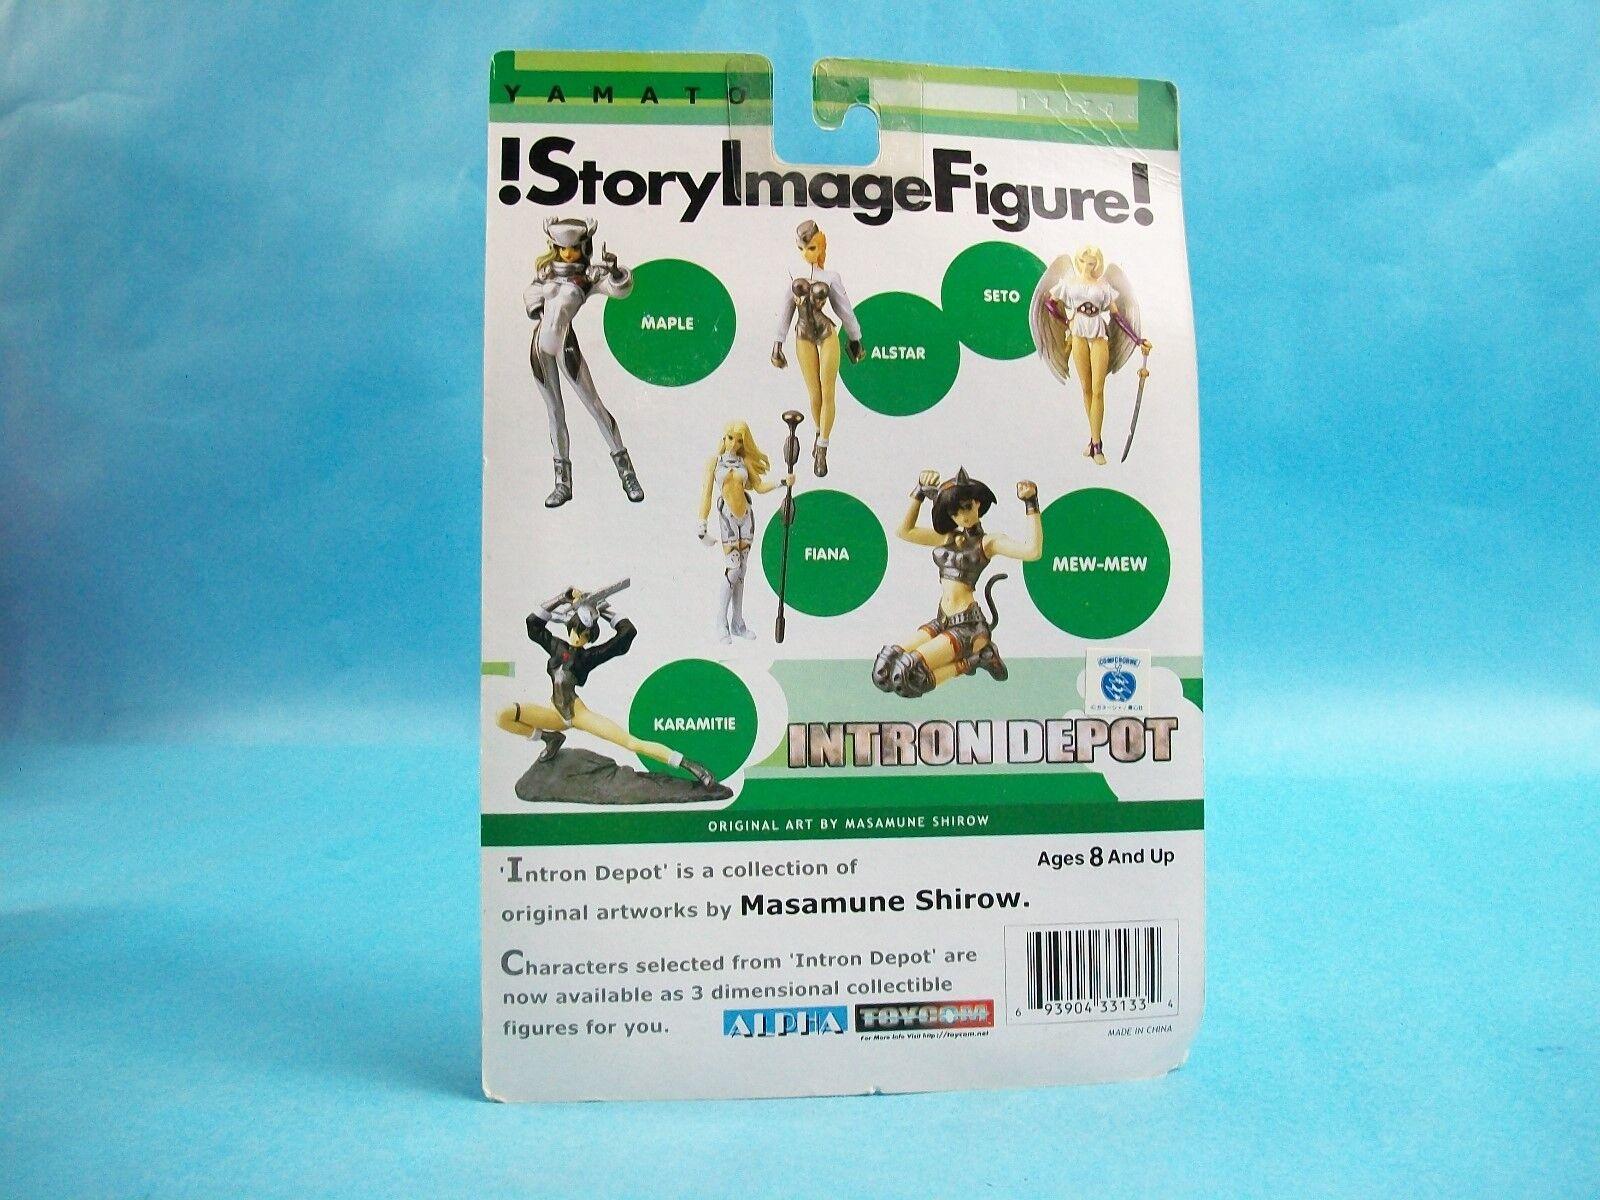 Intron Depot Masamune Shirow Karamitie Story Image Figure Action- & Spielfiguren